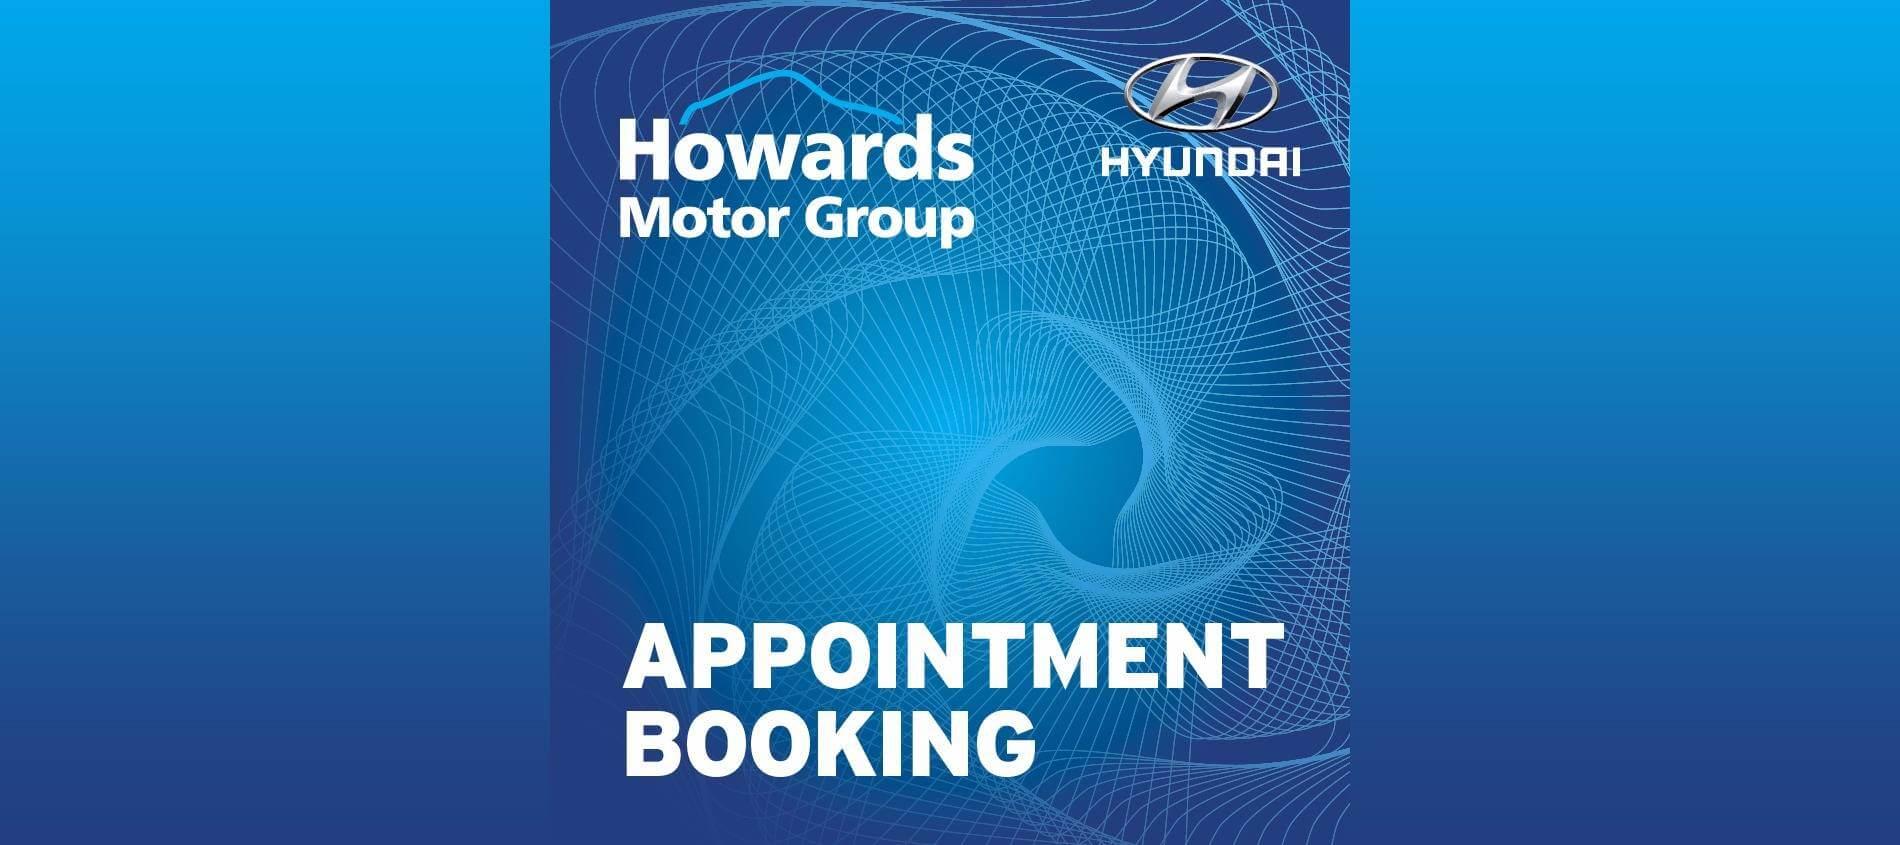 hyundai-apt-booking_1